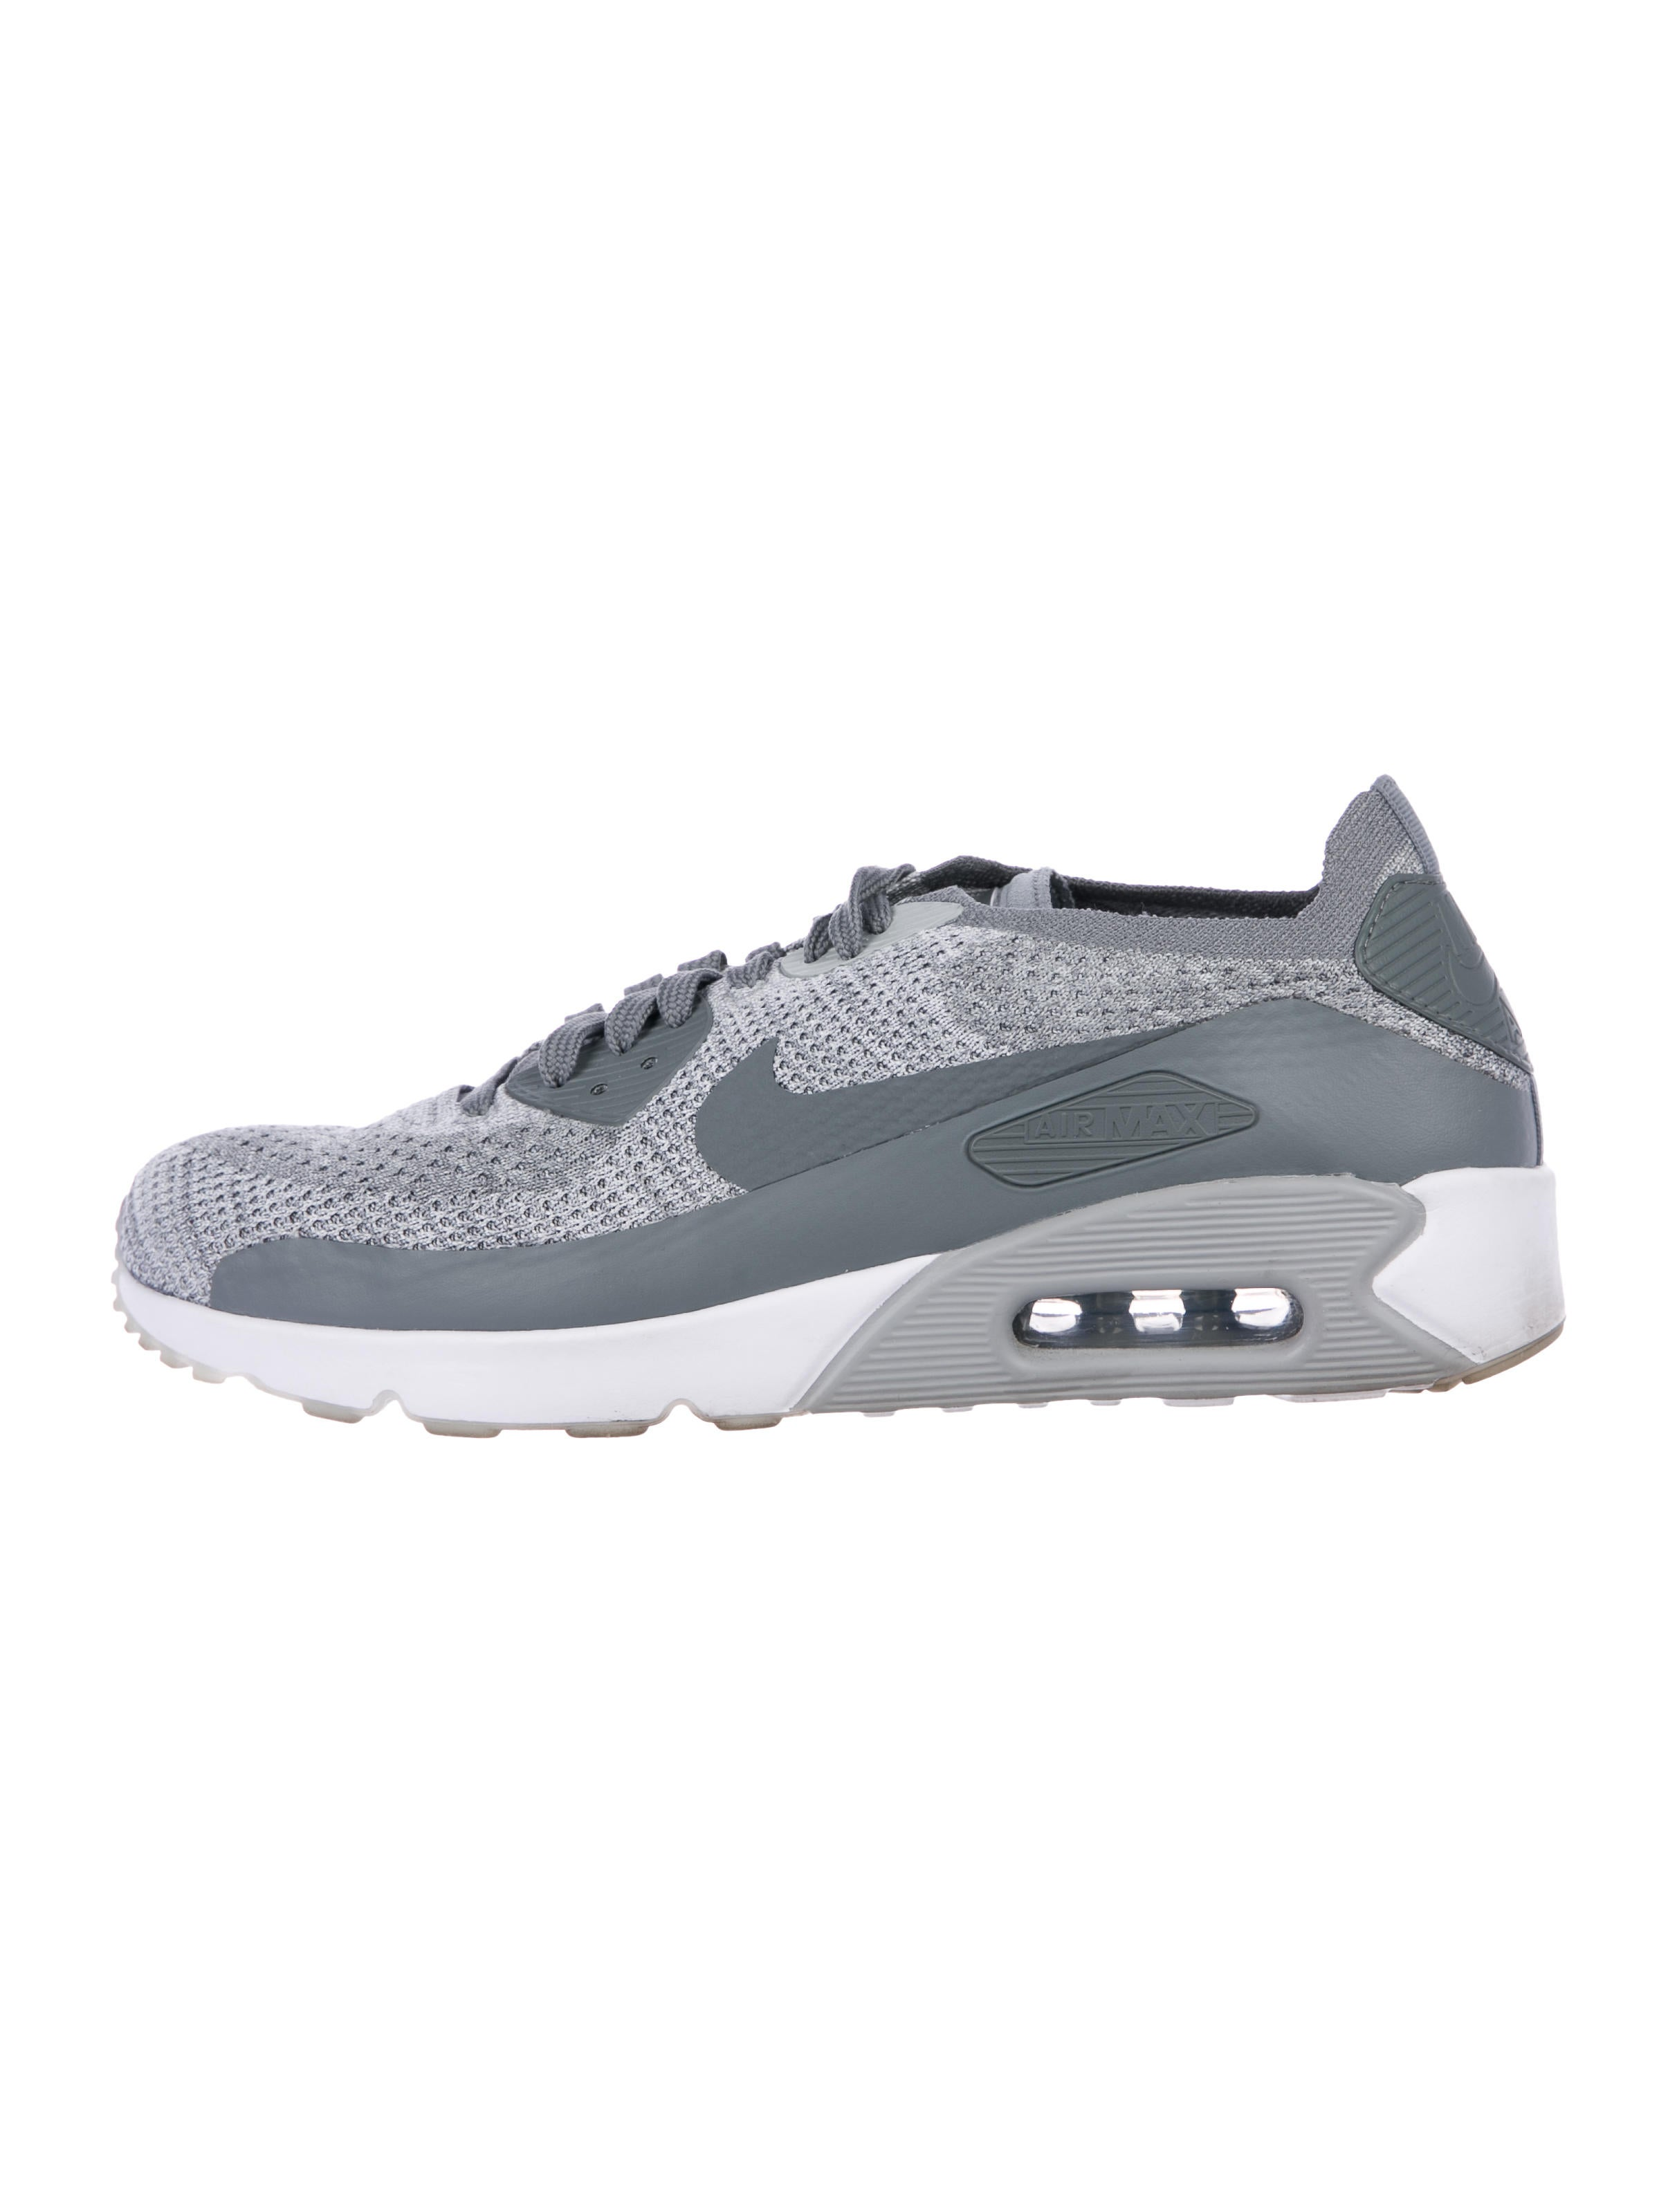 Nike Air Max 90 Ultra 2.0 Flyknit Sneakers - Shoes - WU225444  83694b3b1